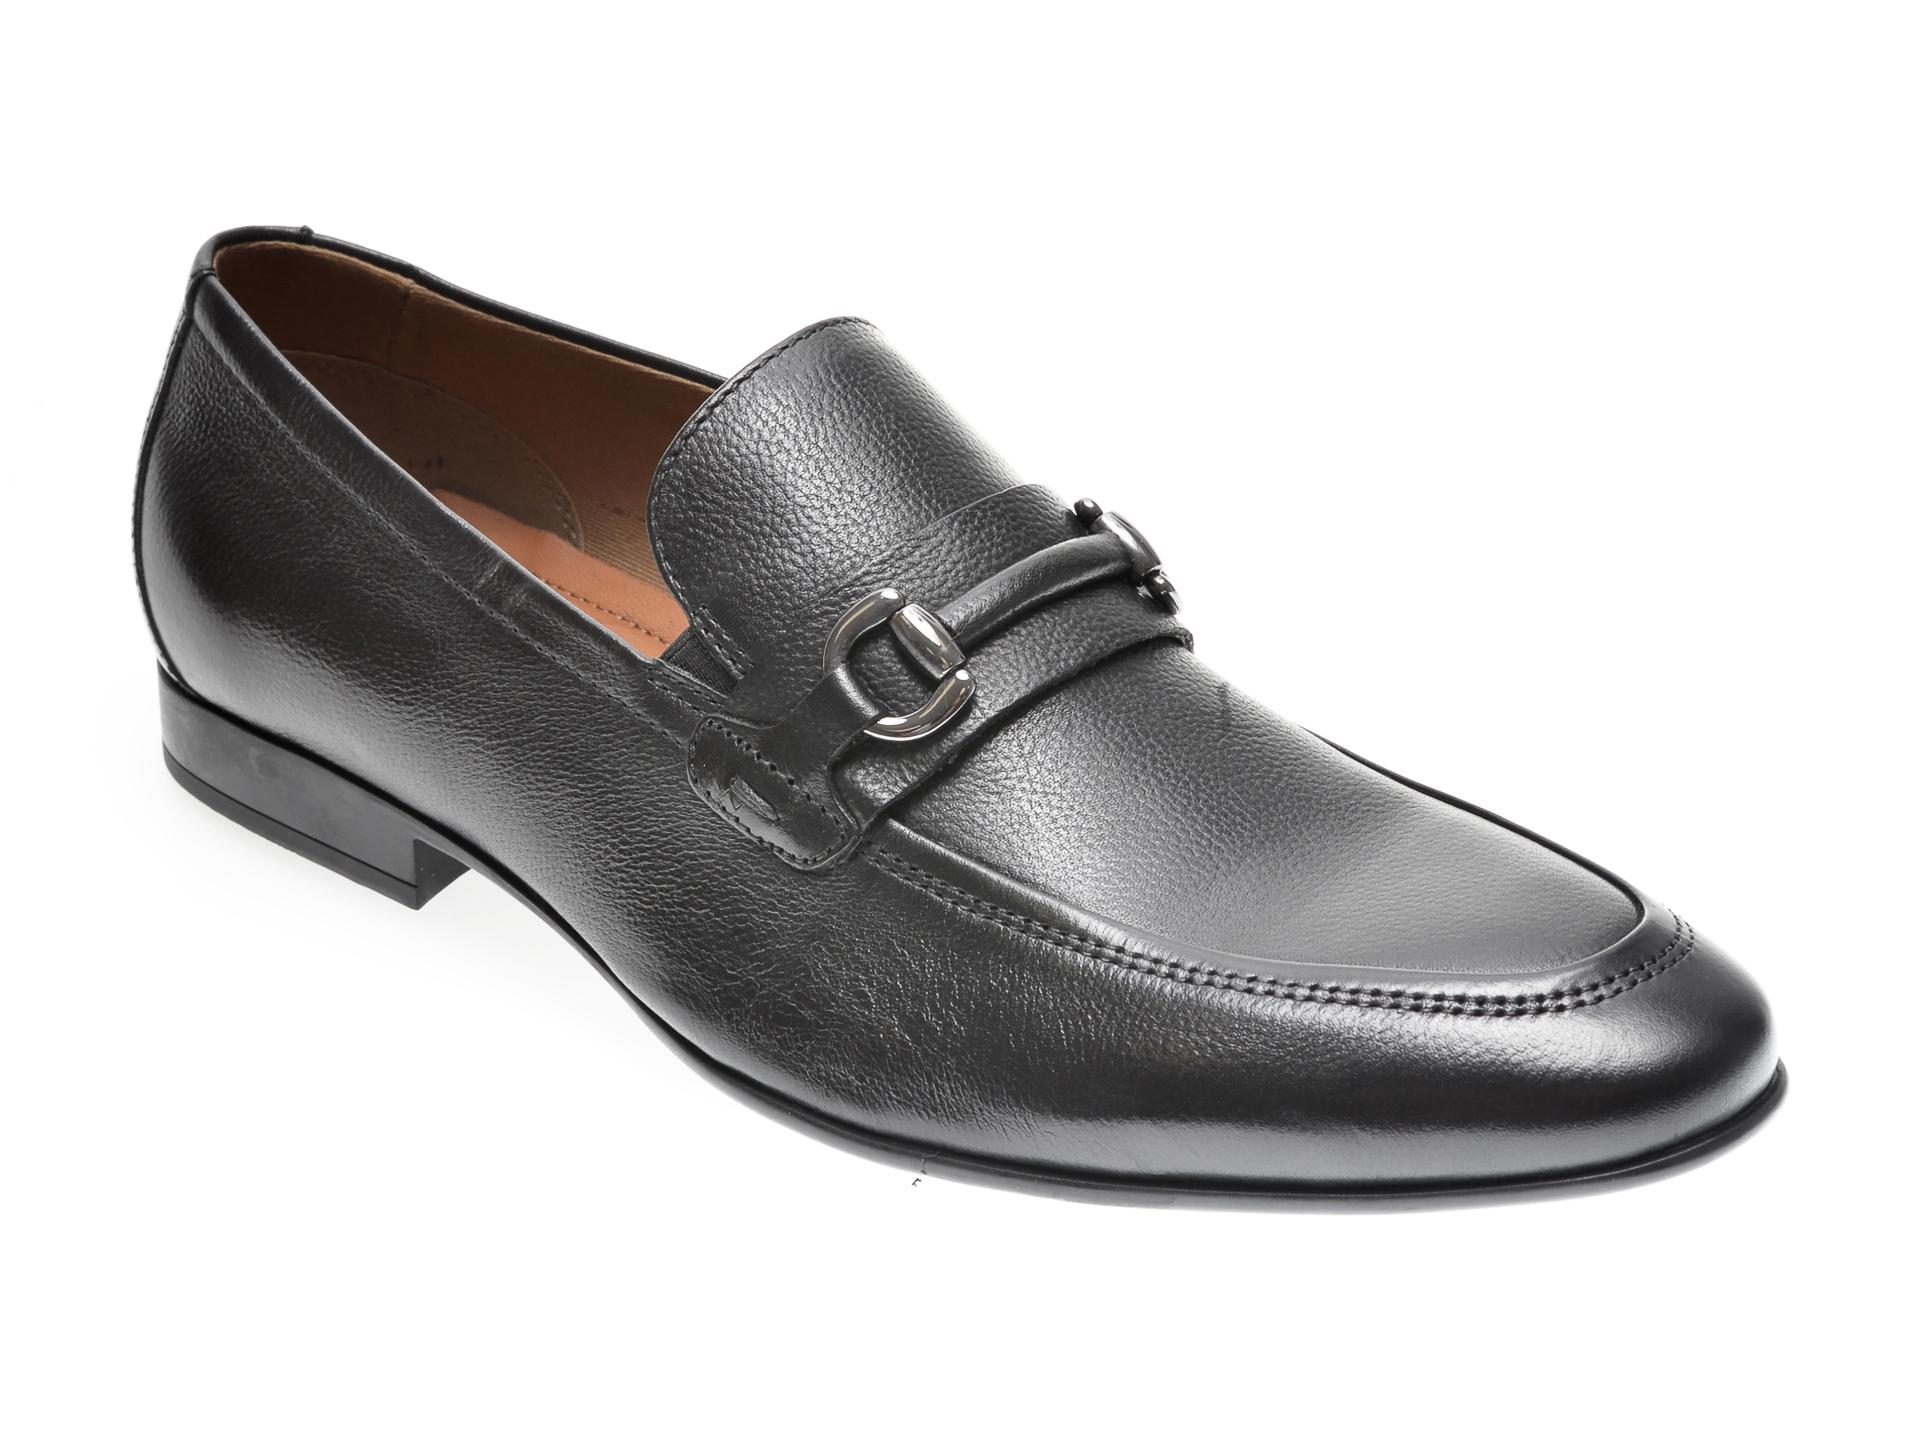 Pantofi ALDO negri, Jijaws001, din piele naturala imagine